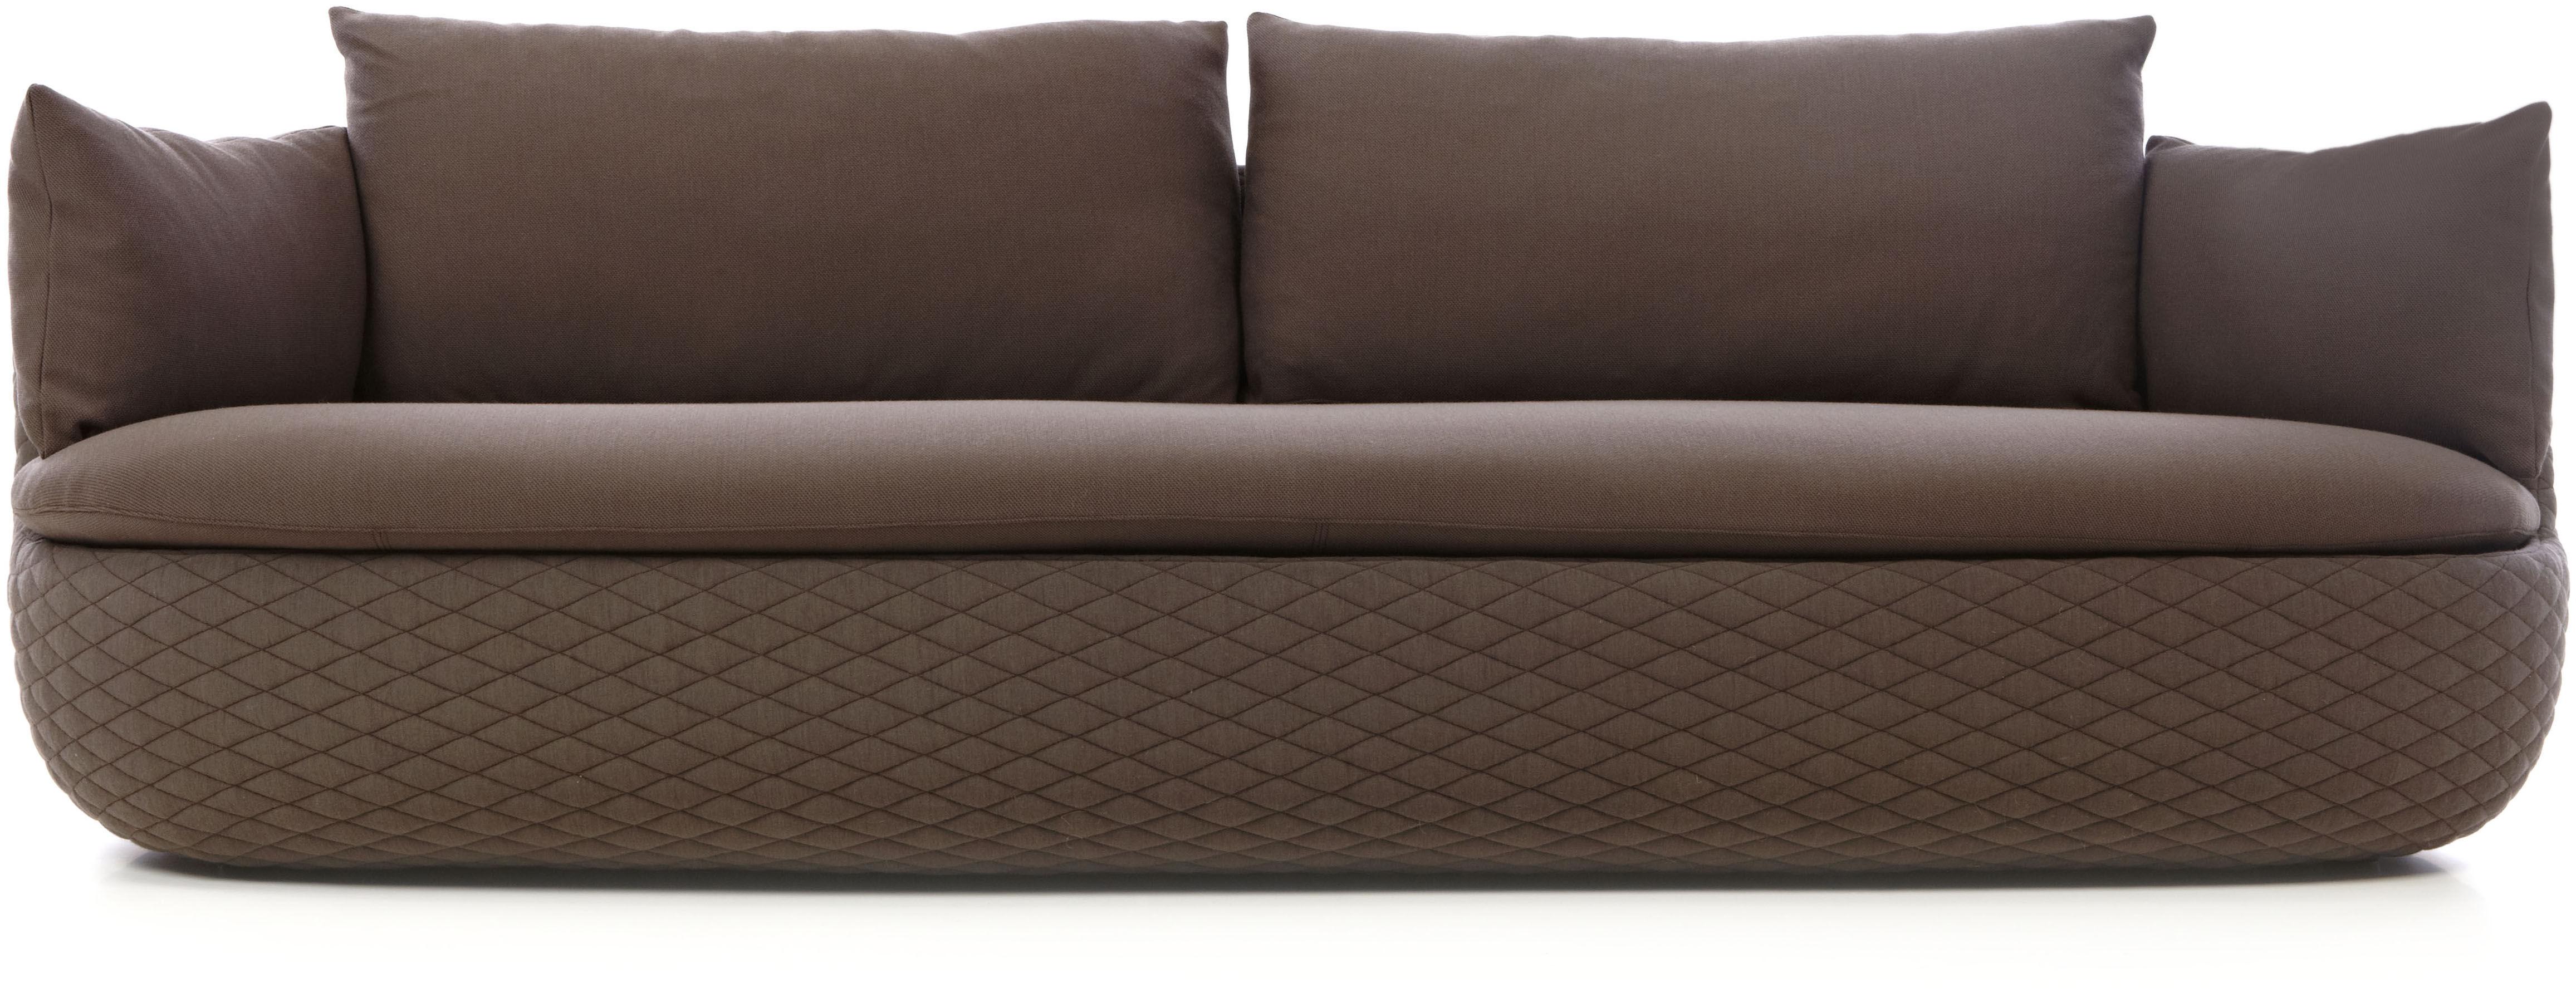 canap droit bart l 235 cm tissu tissu marron moooi. Black Bedroom Furniture Sets. Home Design Ideas